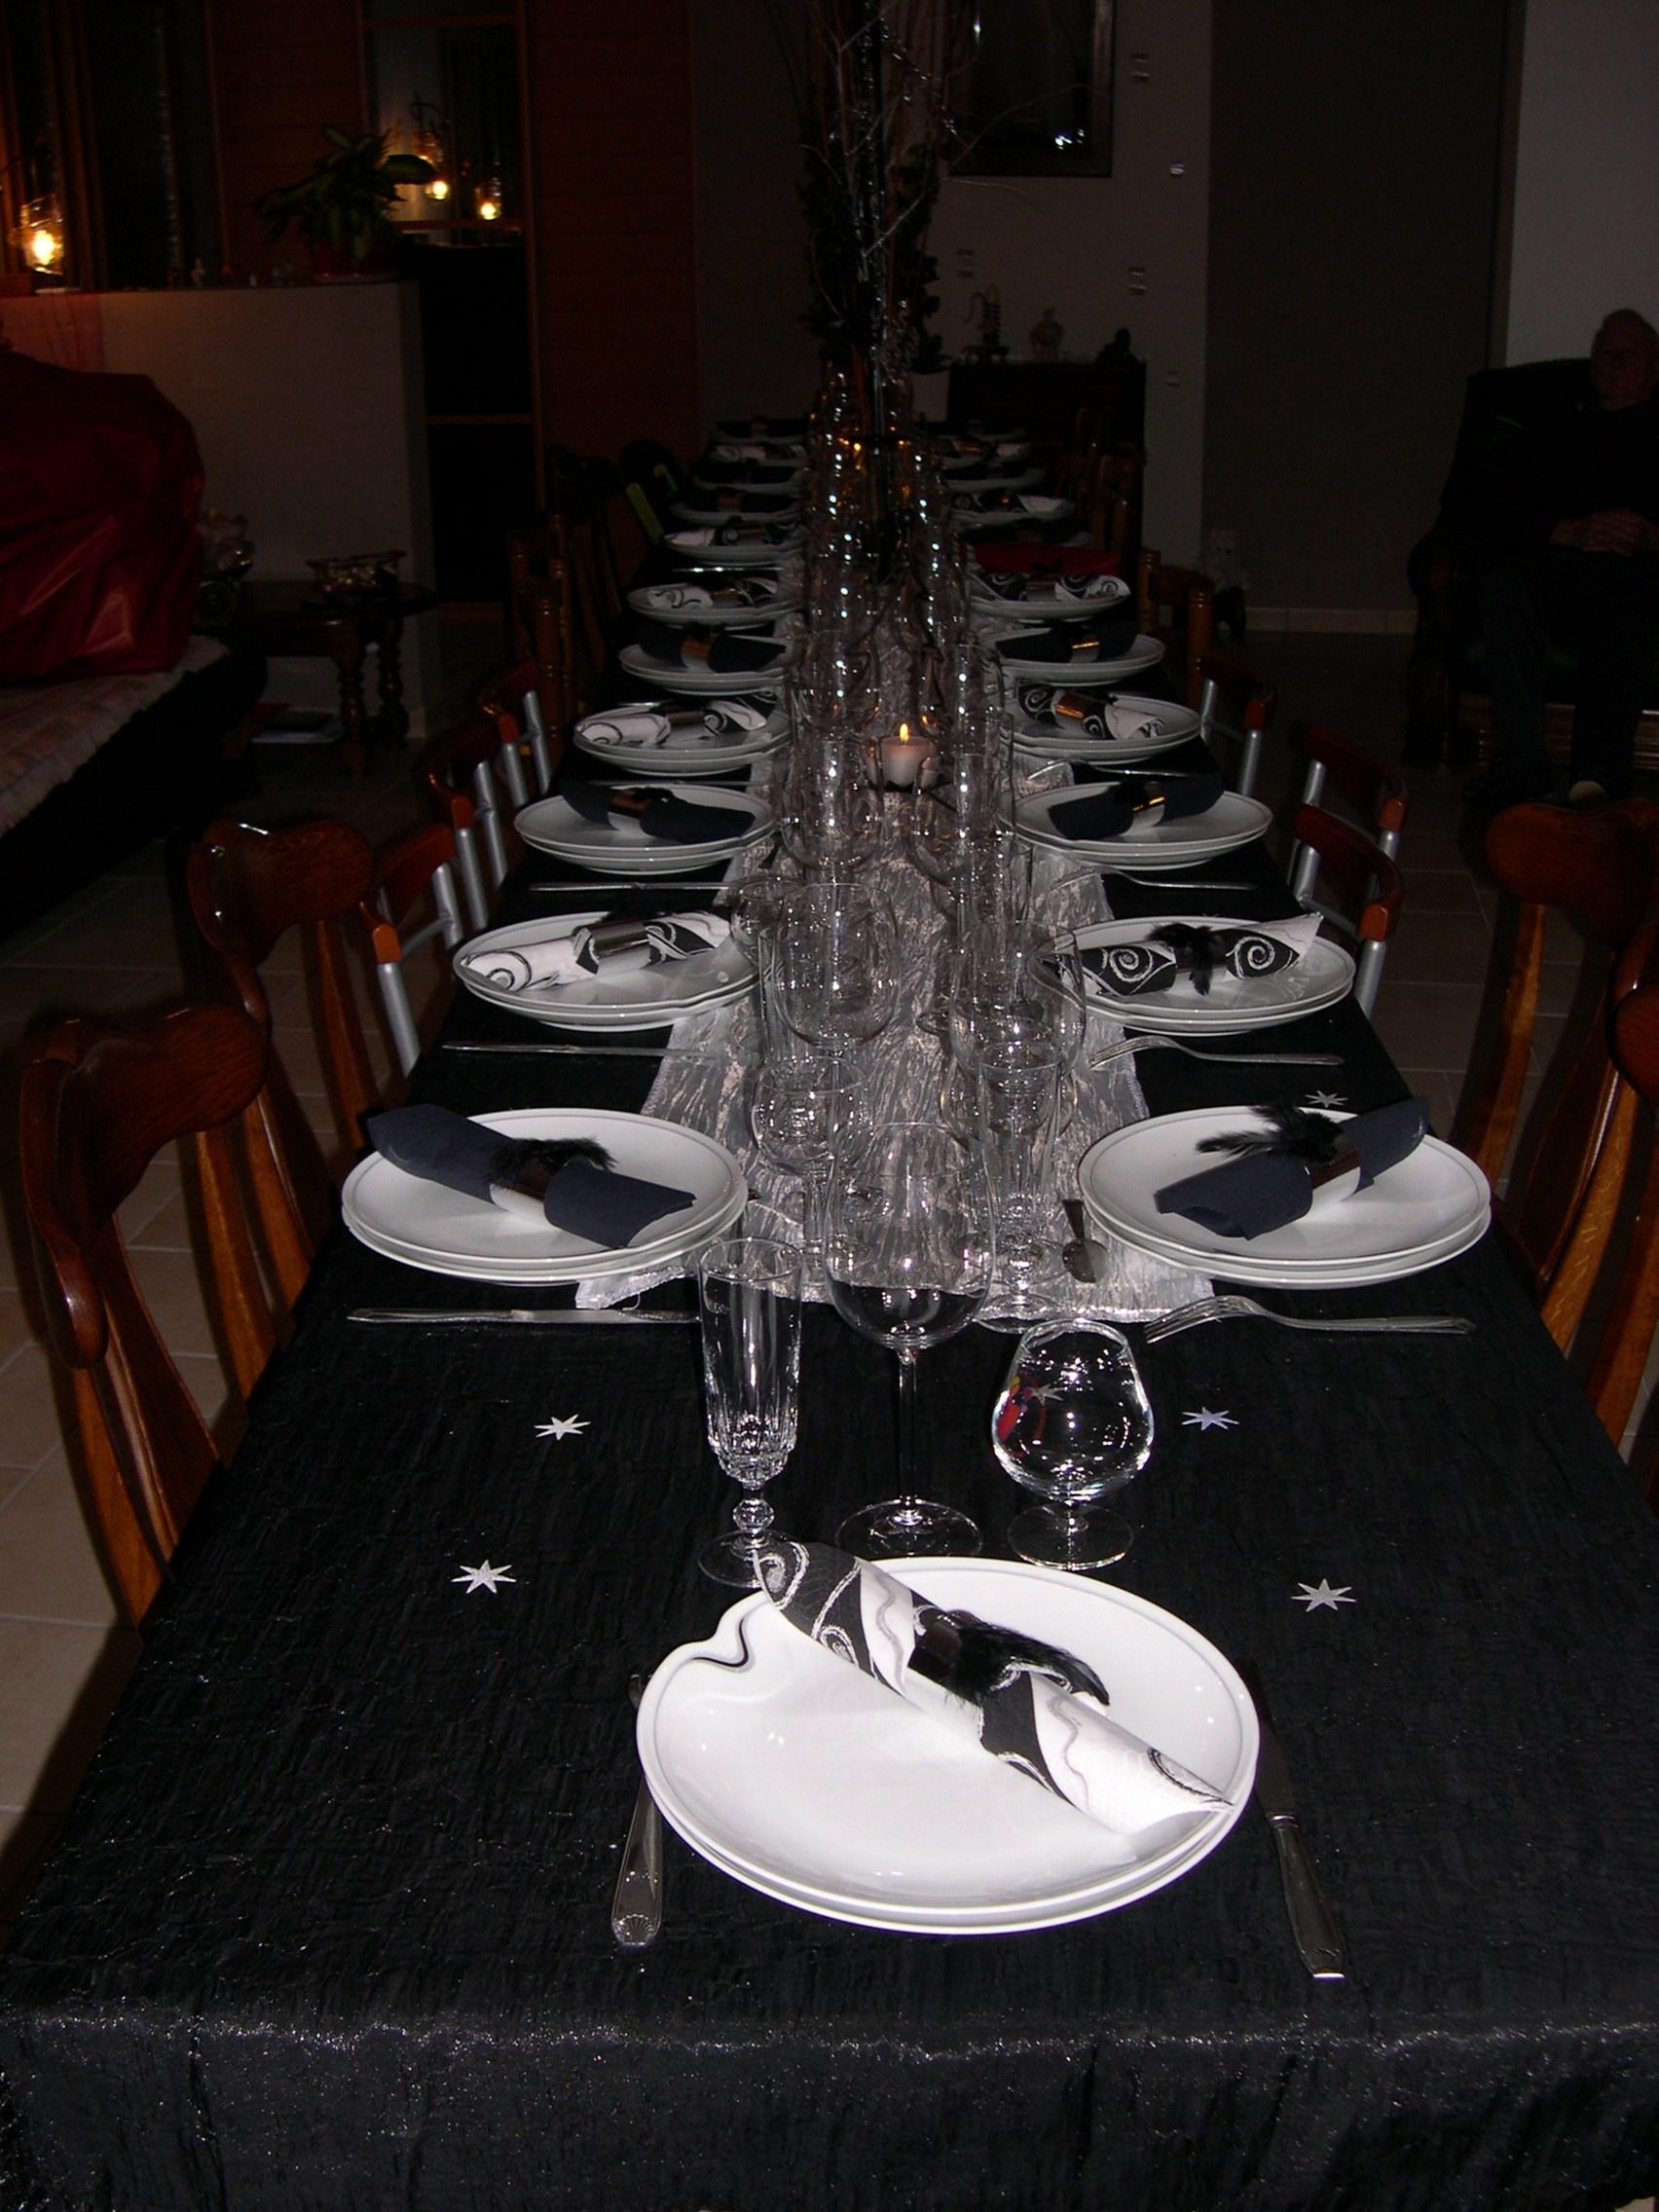 D co de tables sebetfredconseil - Table noel blanc ...